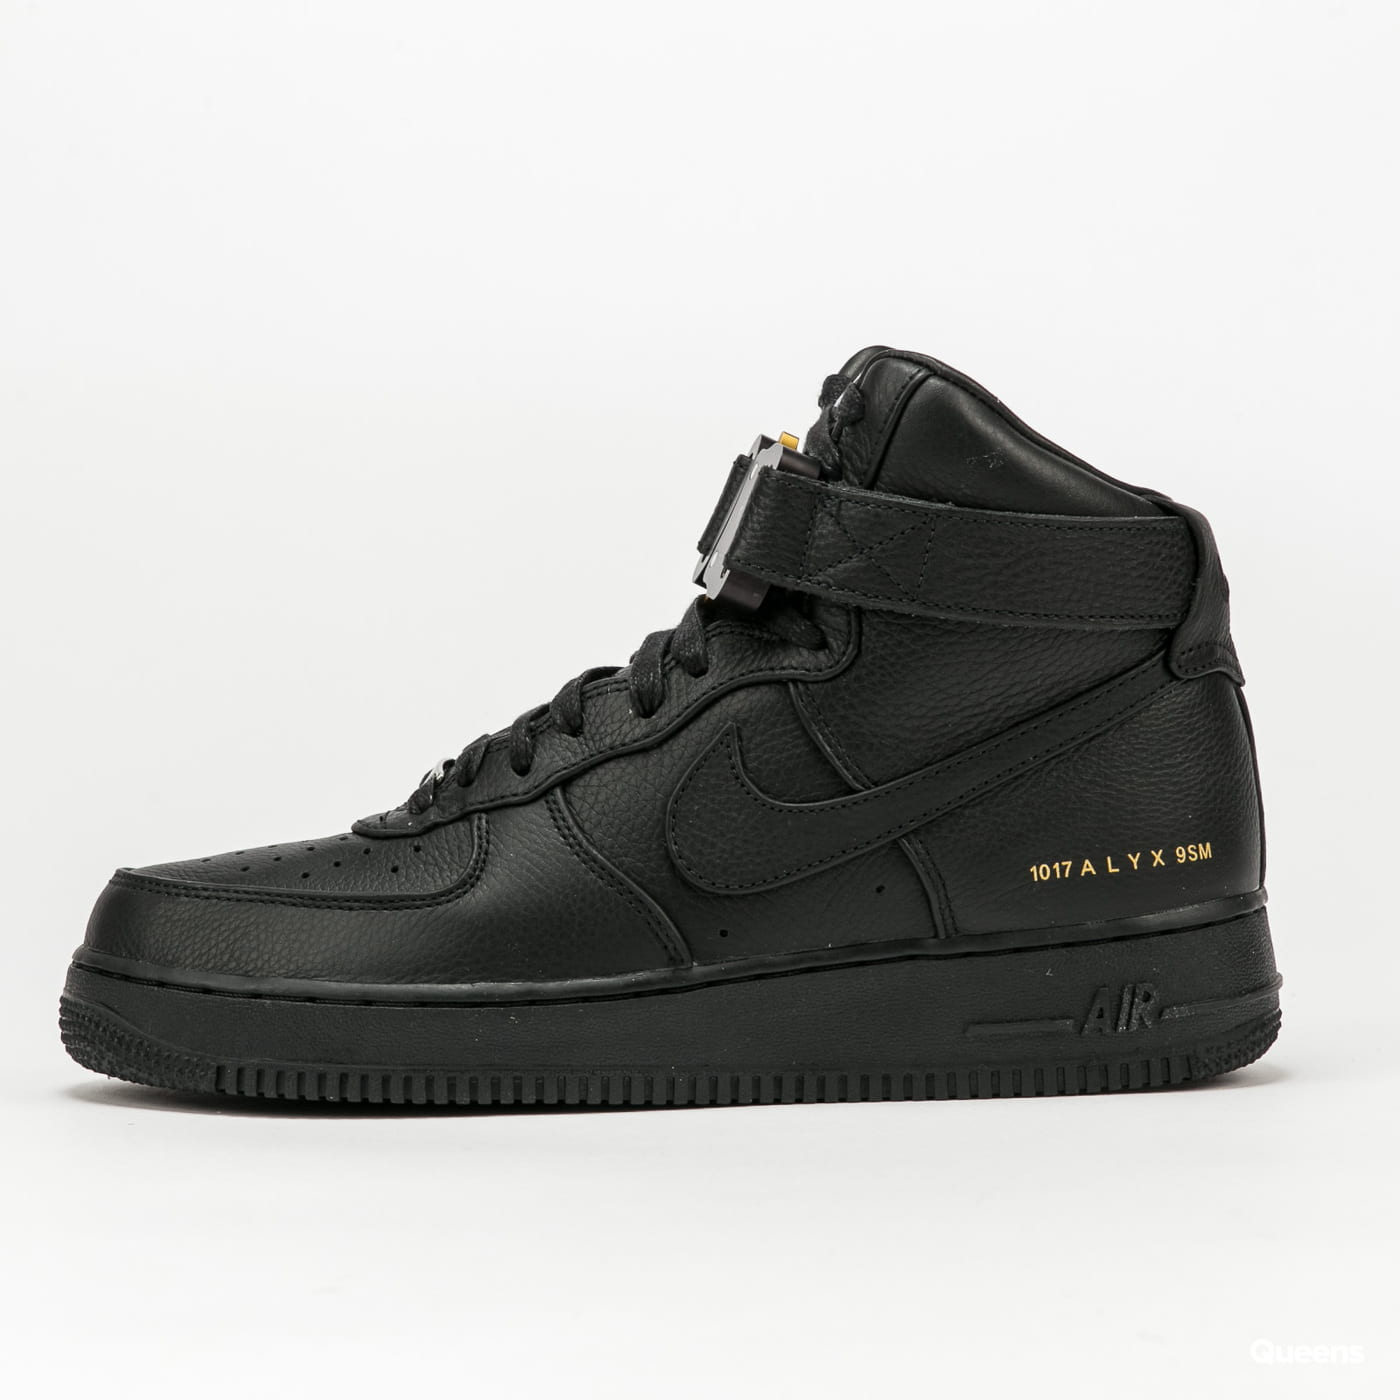 Nike Air Force 1 HI / ALYX black / black - metallic gold